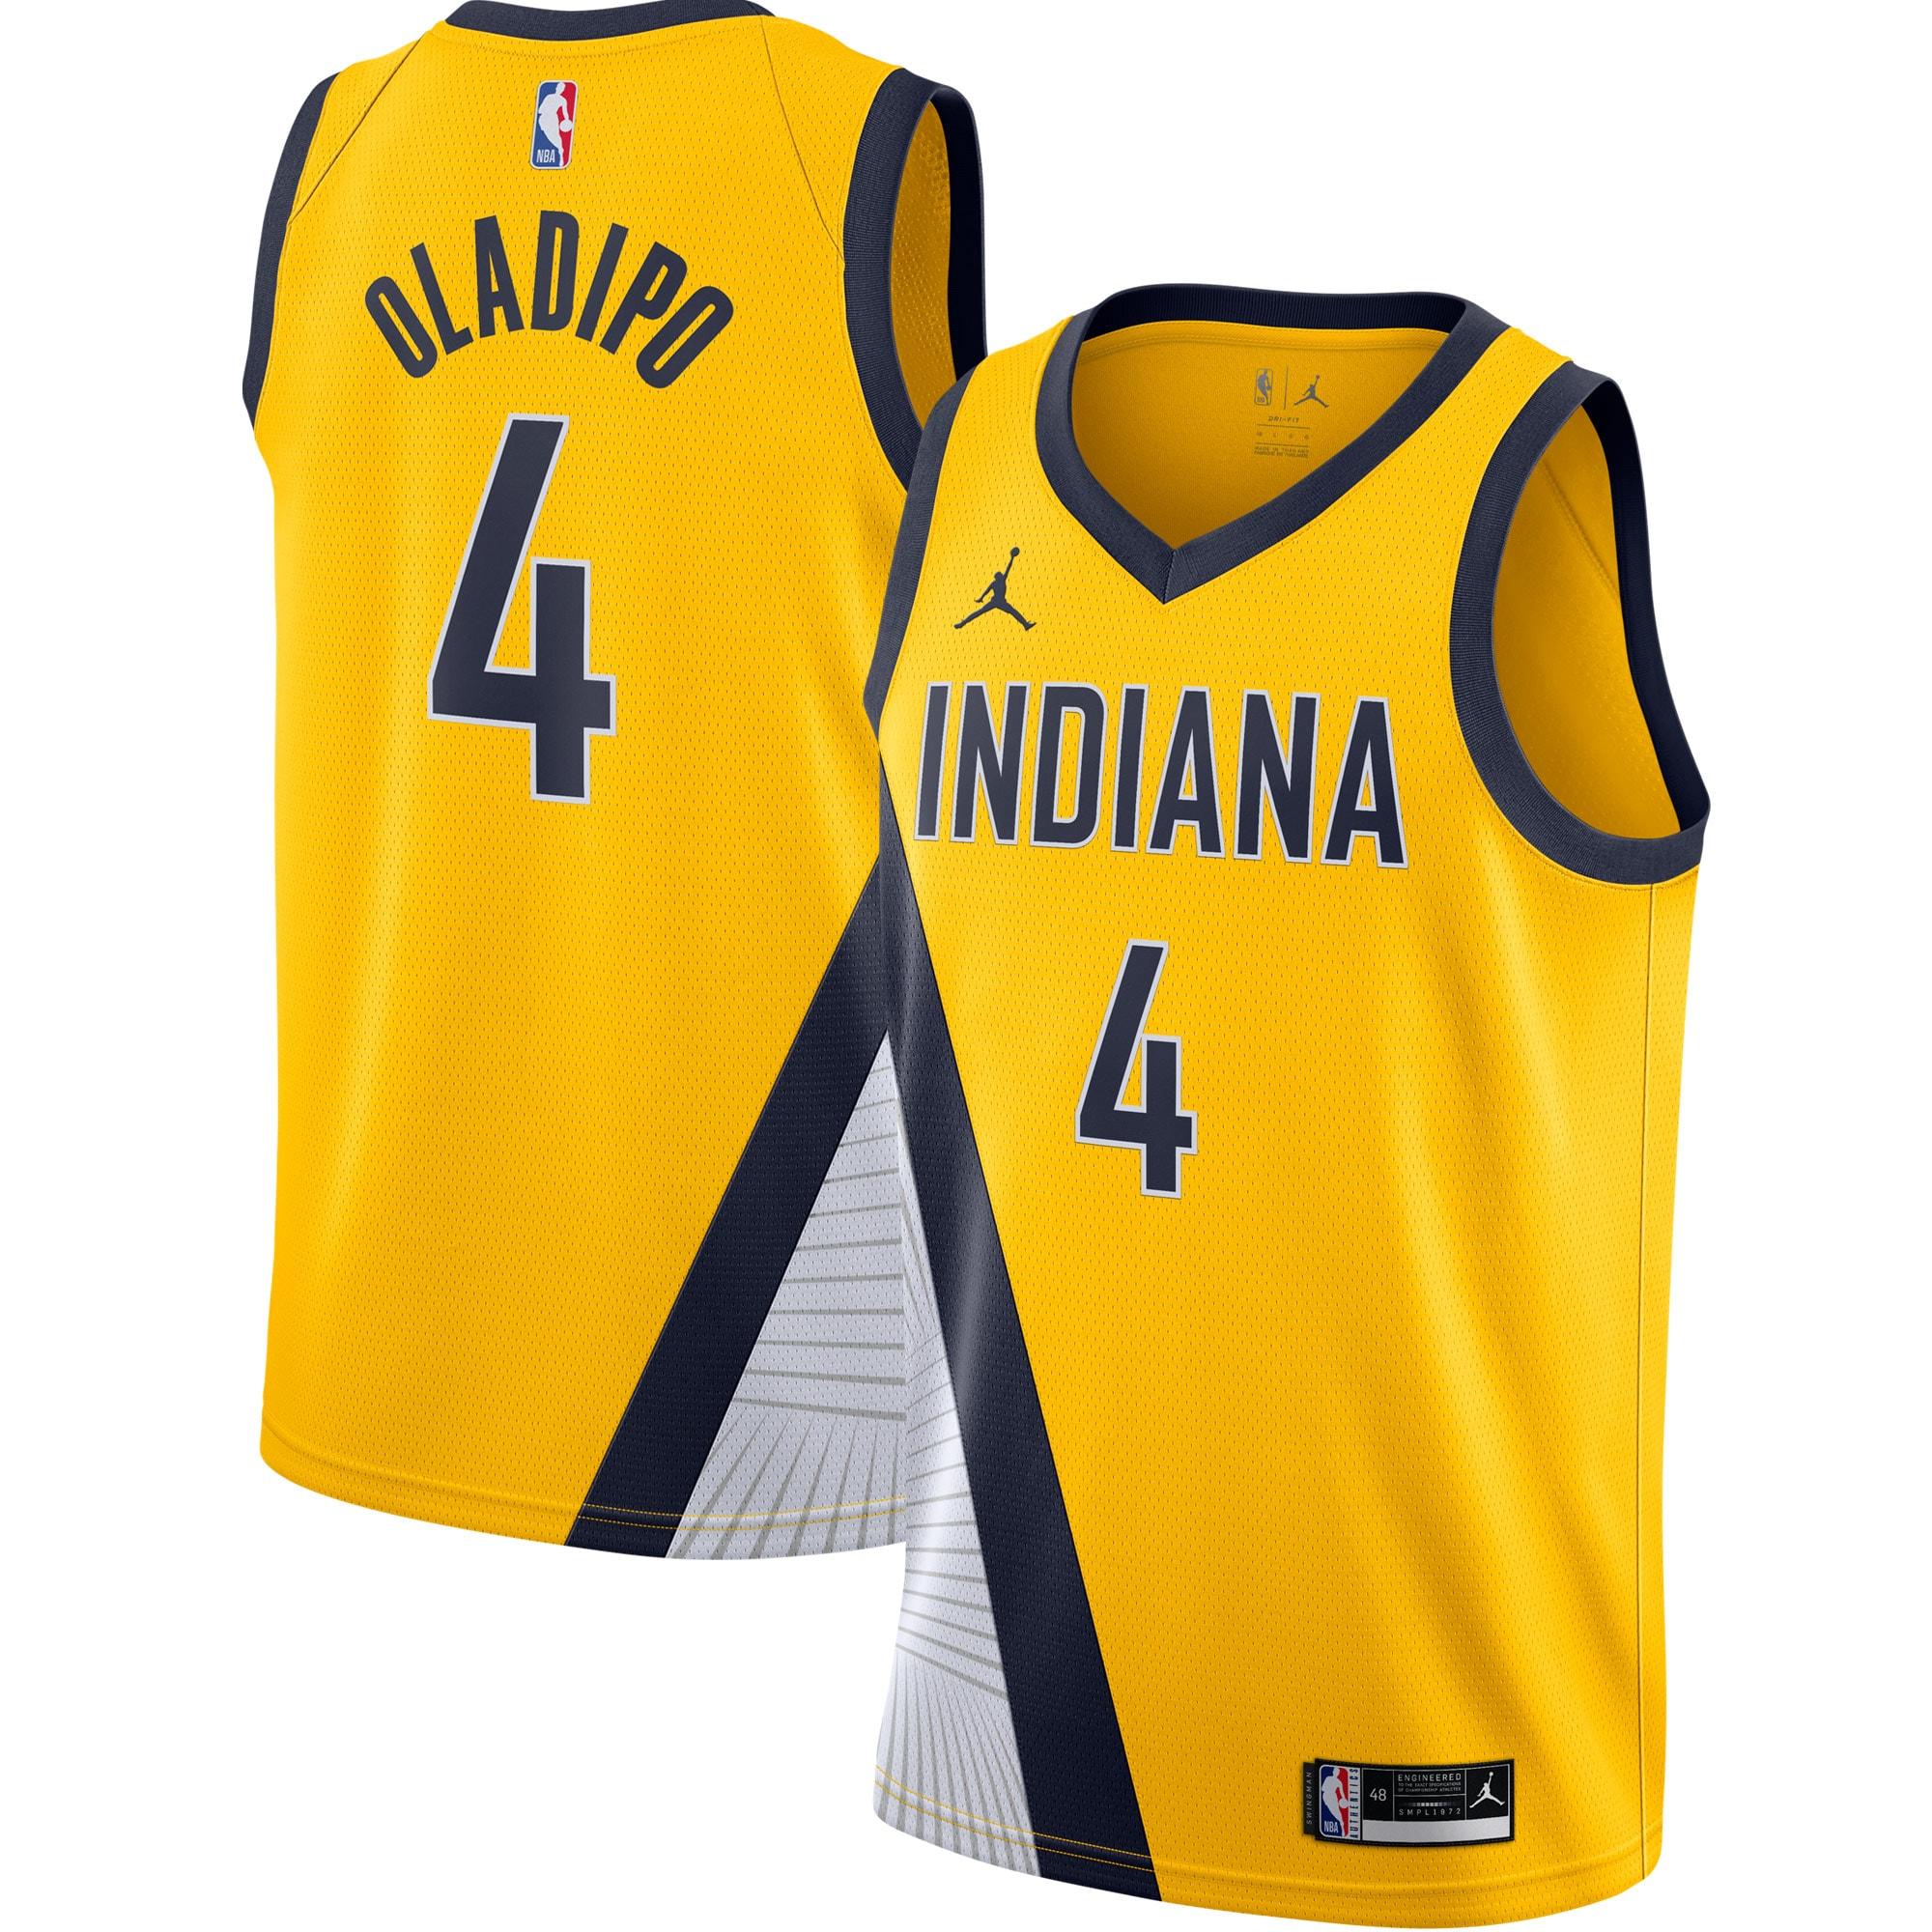 Victor Oladipo Indiana Pacers Jordan Brand 2020/21 Swingman Jersey - Statement Edition - Gold